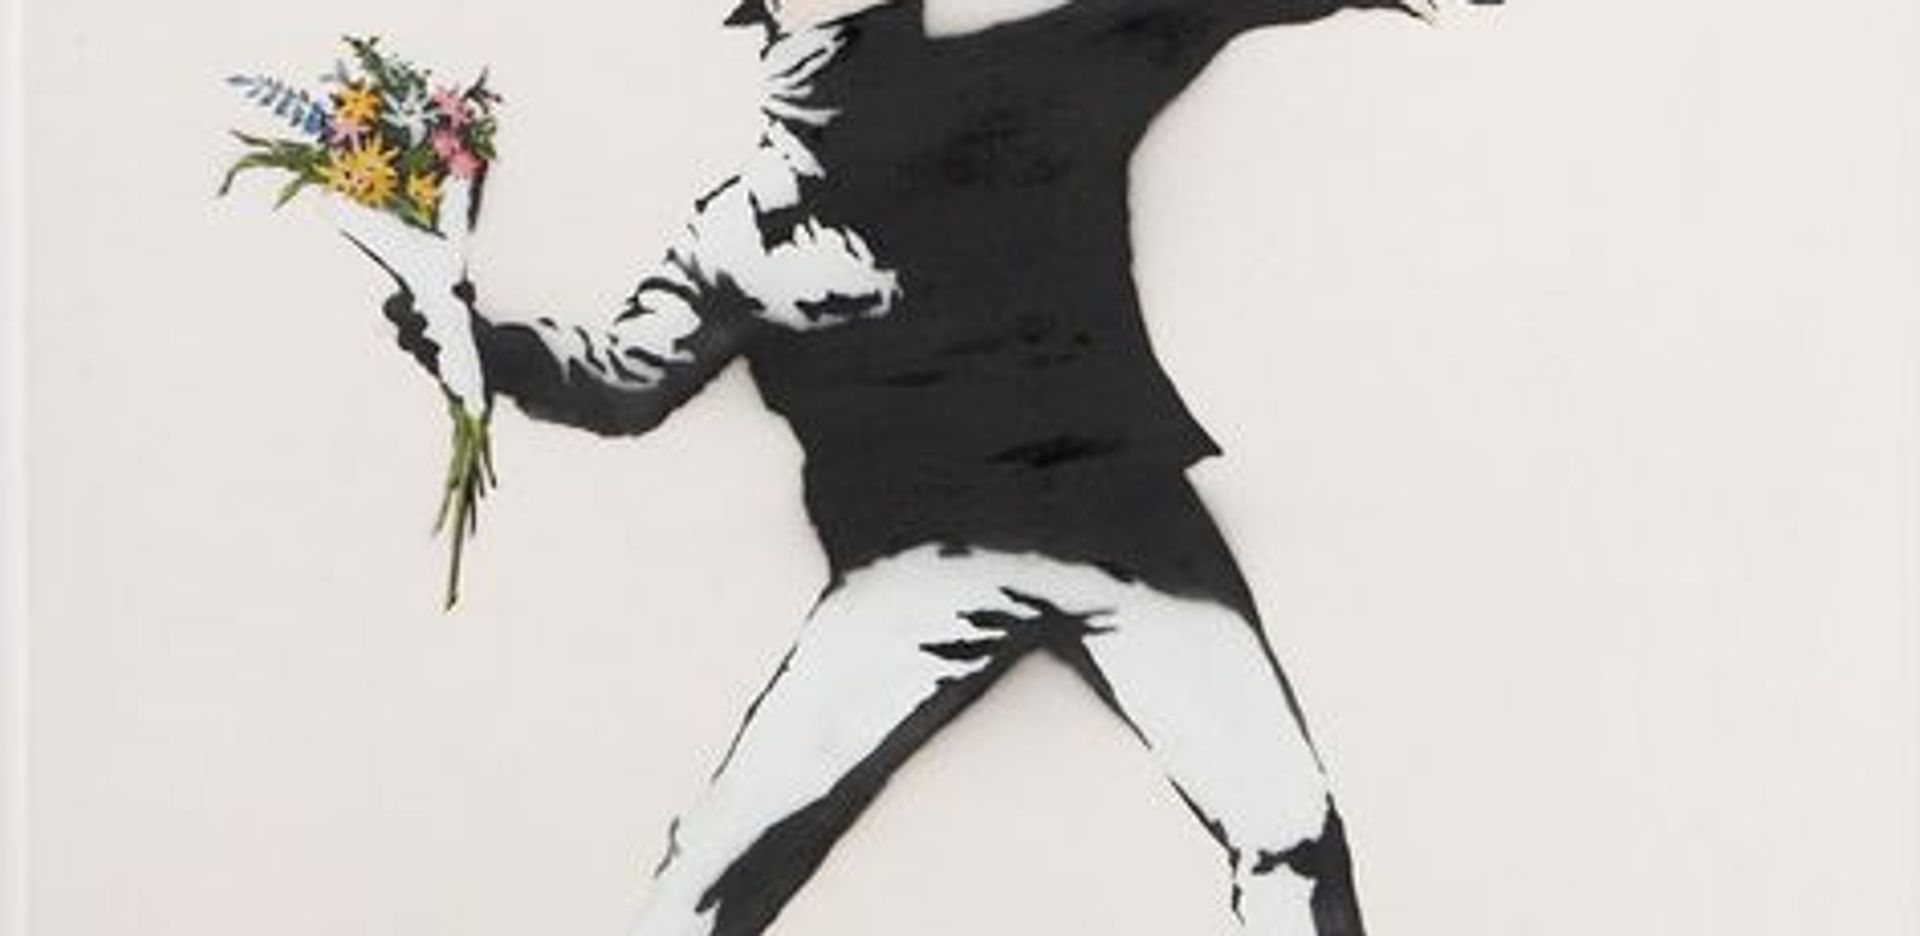 Banksy's Flower Thrower Courtesy of Lazinc